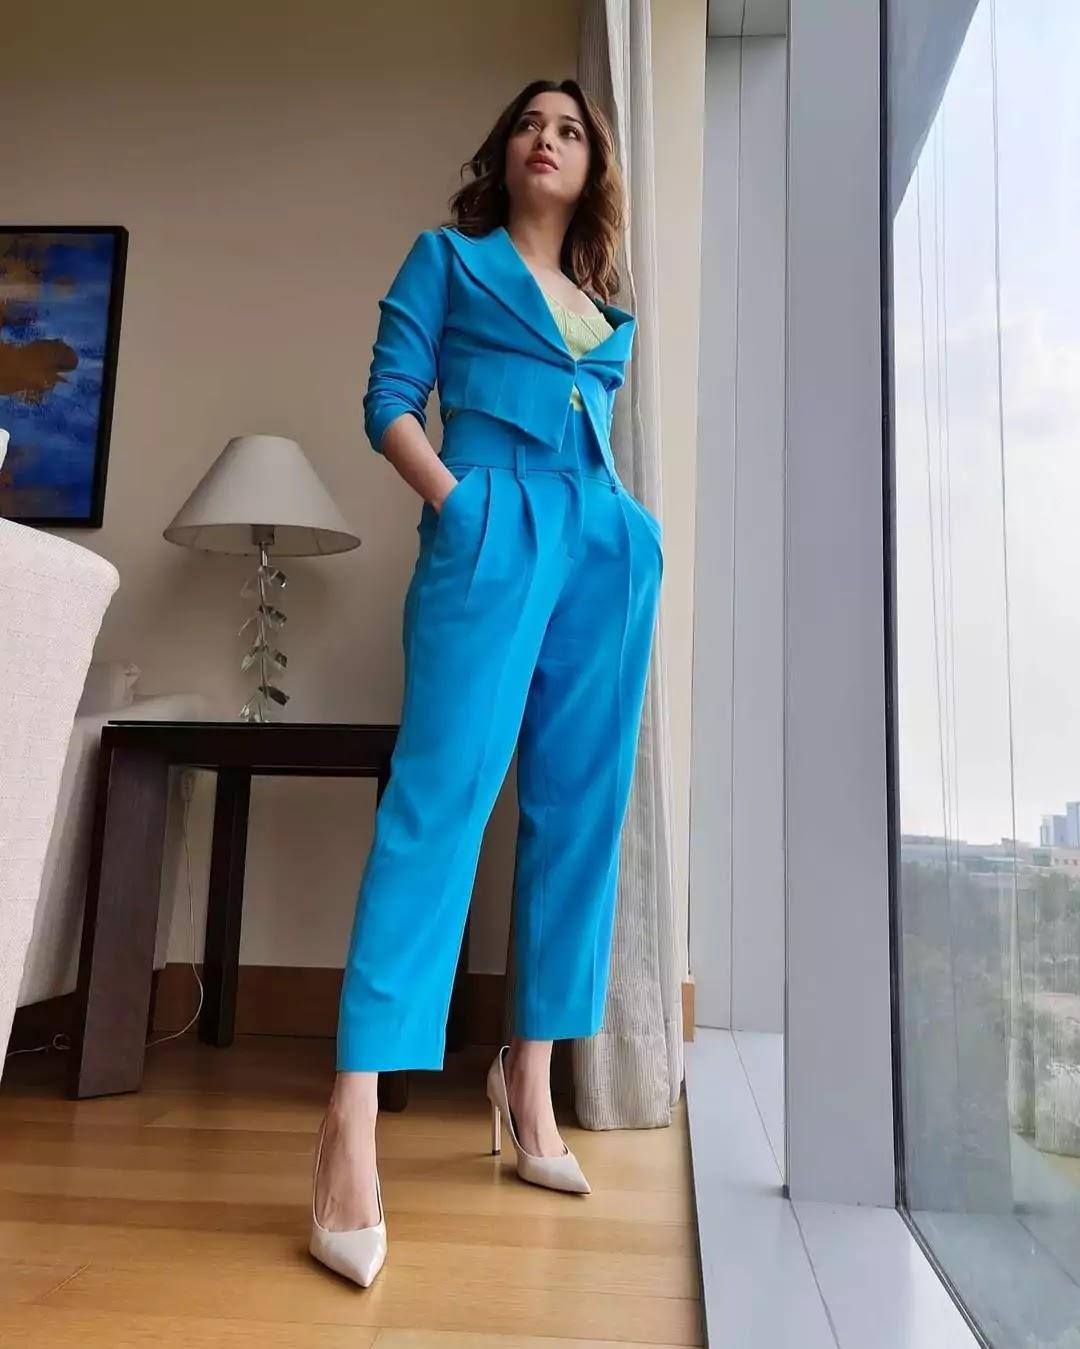 tamannaah-bhatia-in-blue-outfit